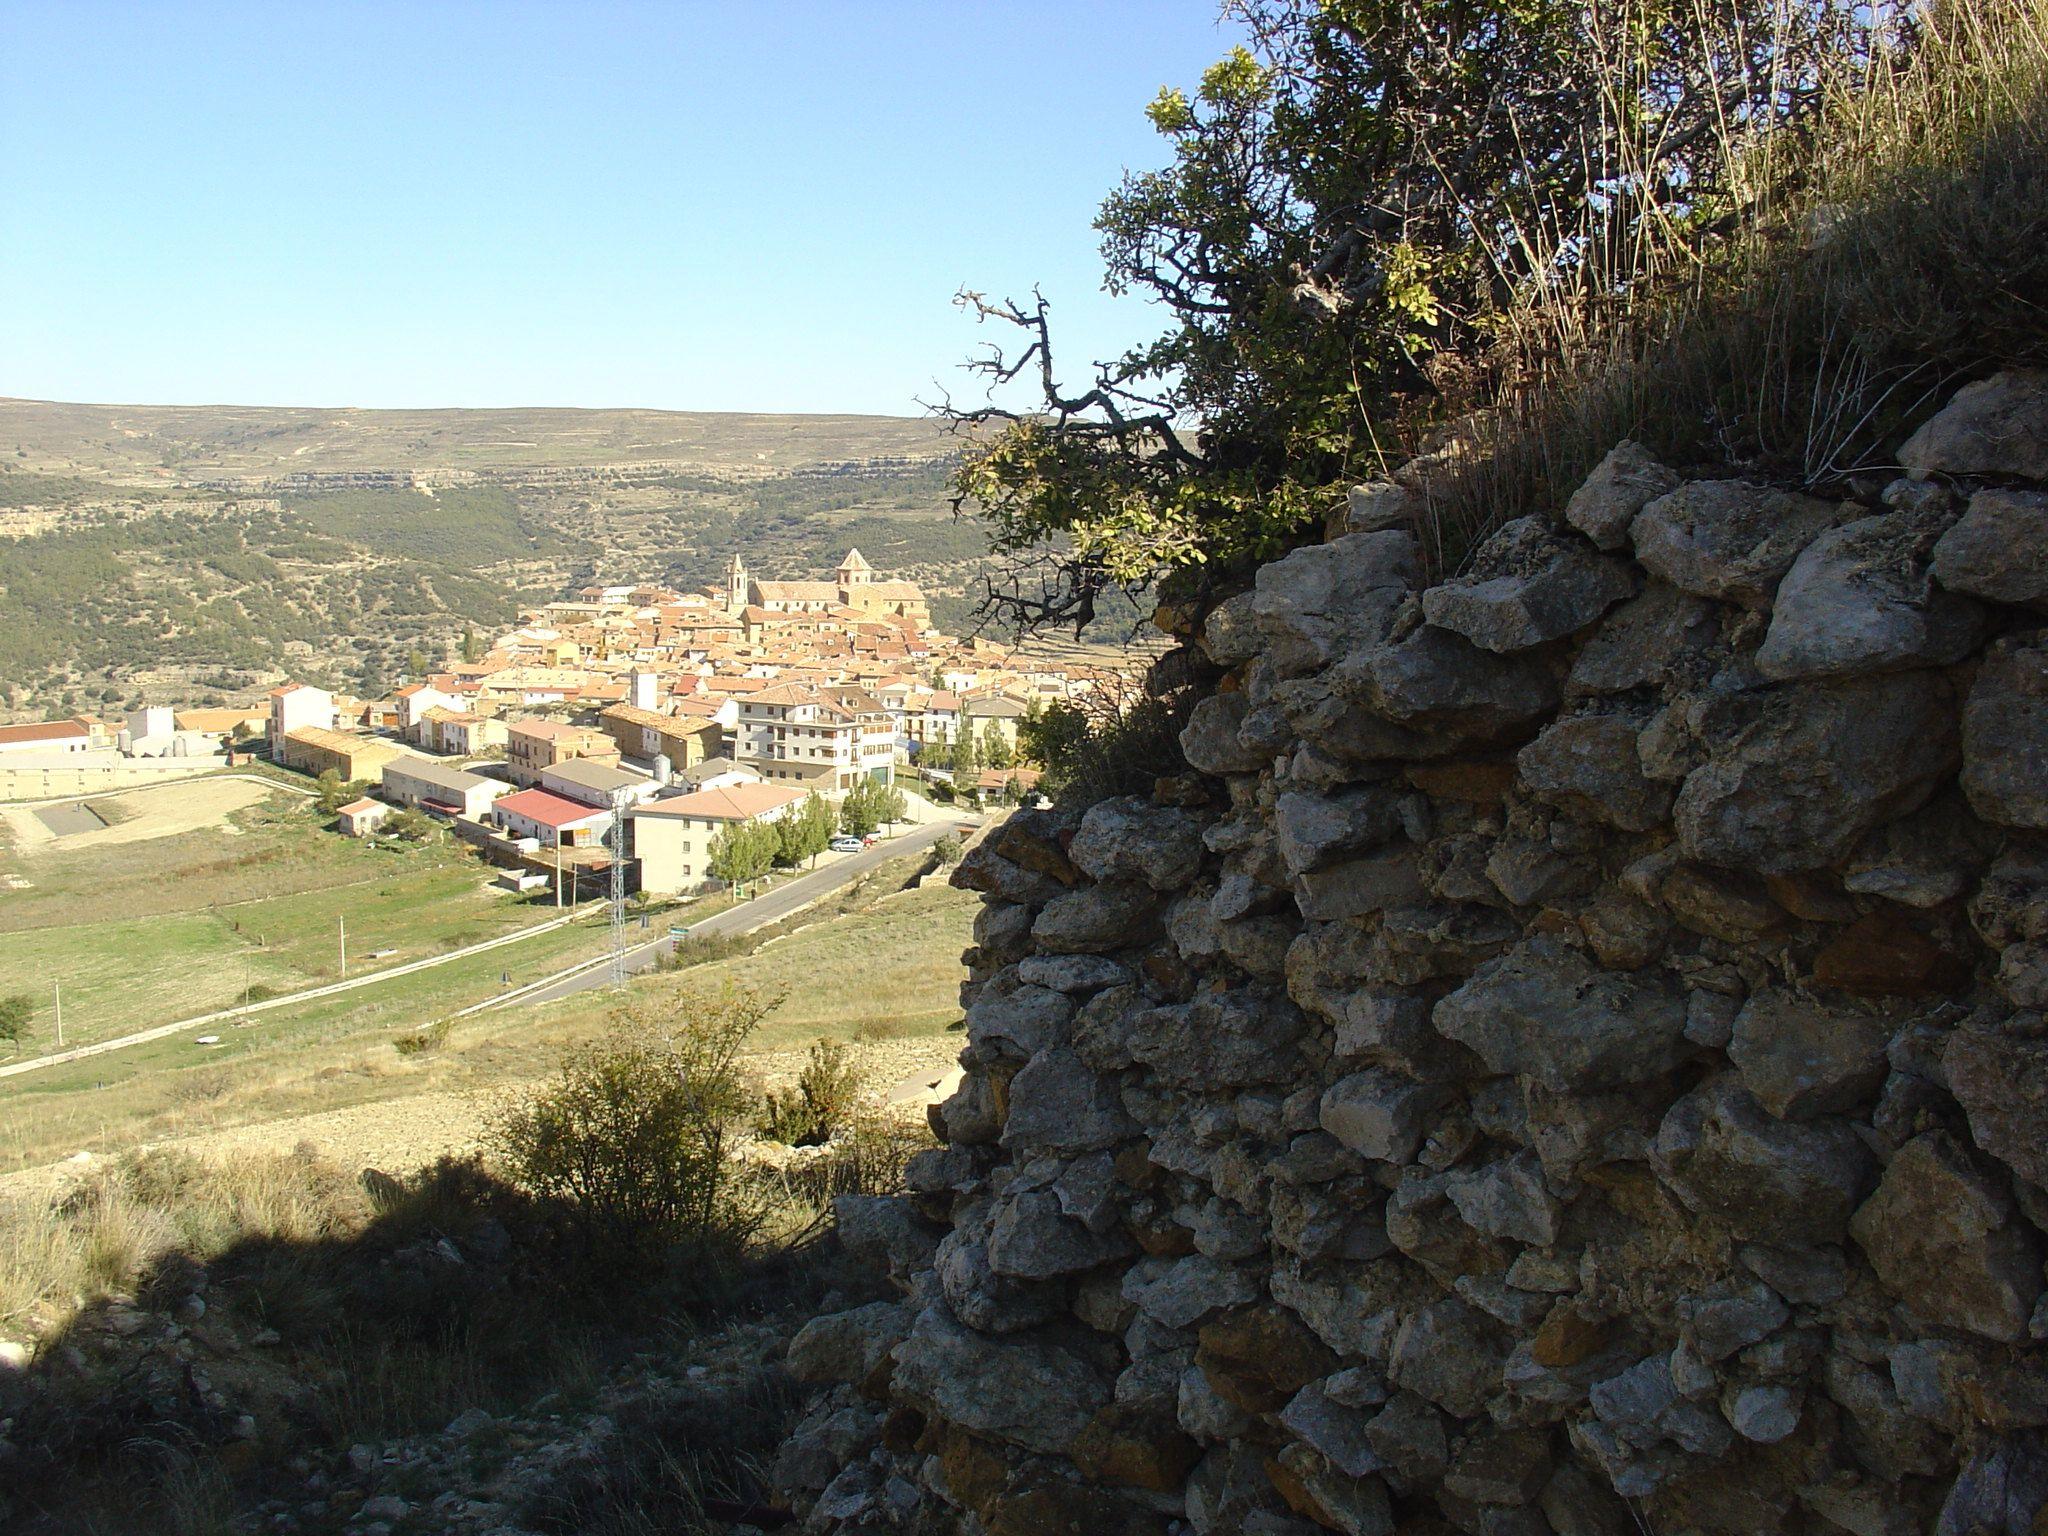 Fuerte carlista de San Blas (Cantavieja)